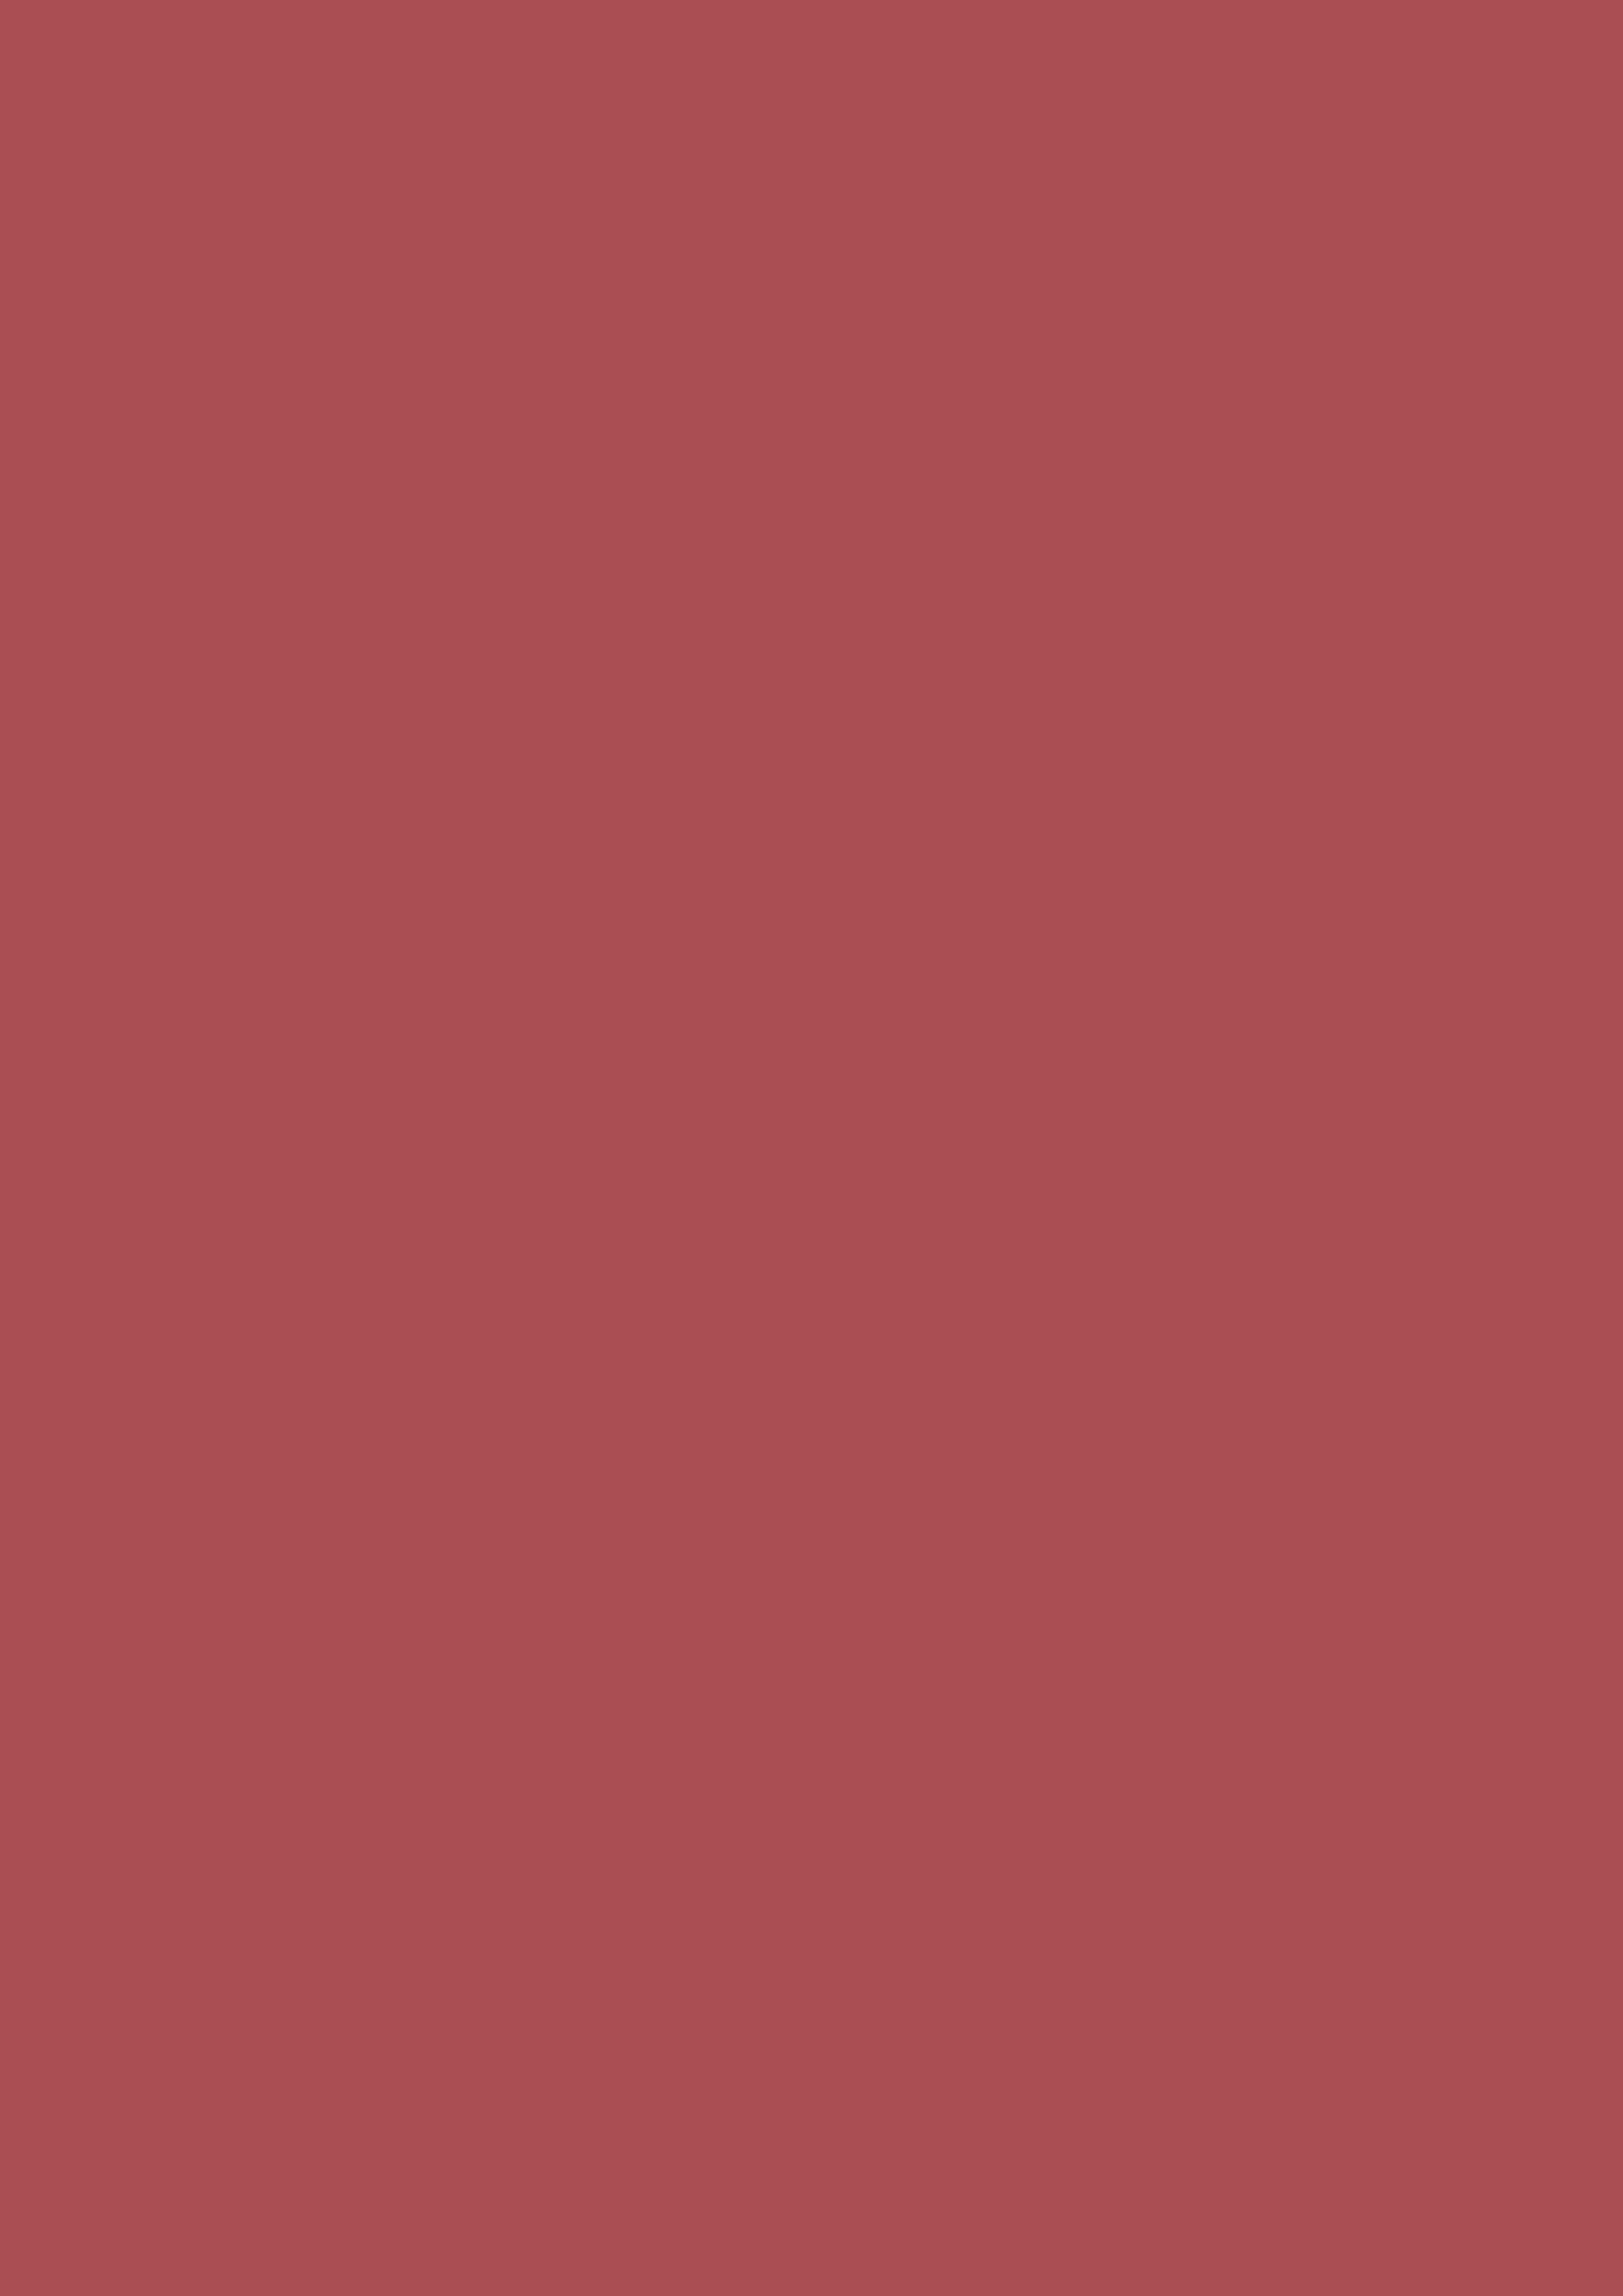 2480x3508 Rose Vale Solid Color Background